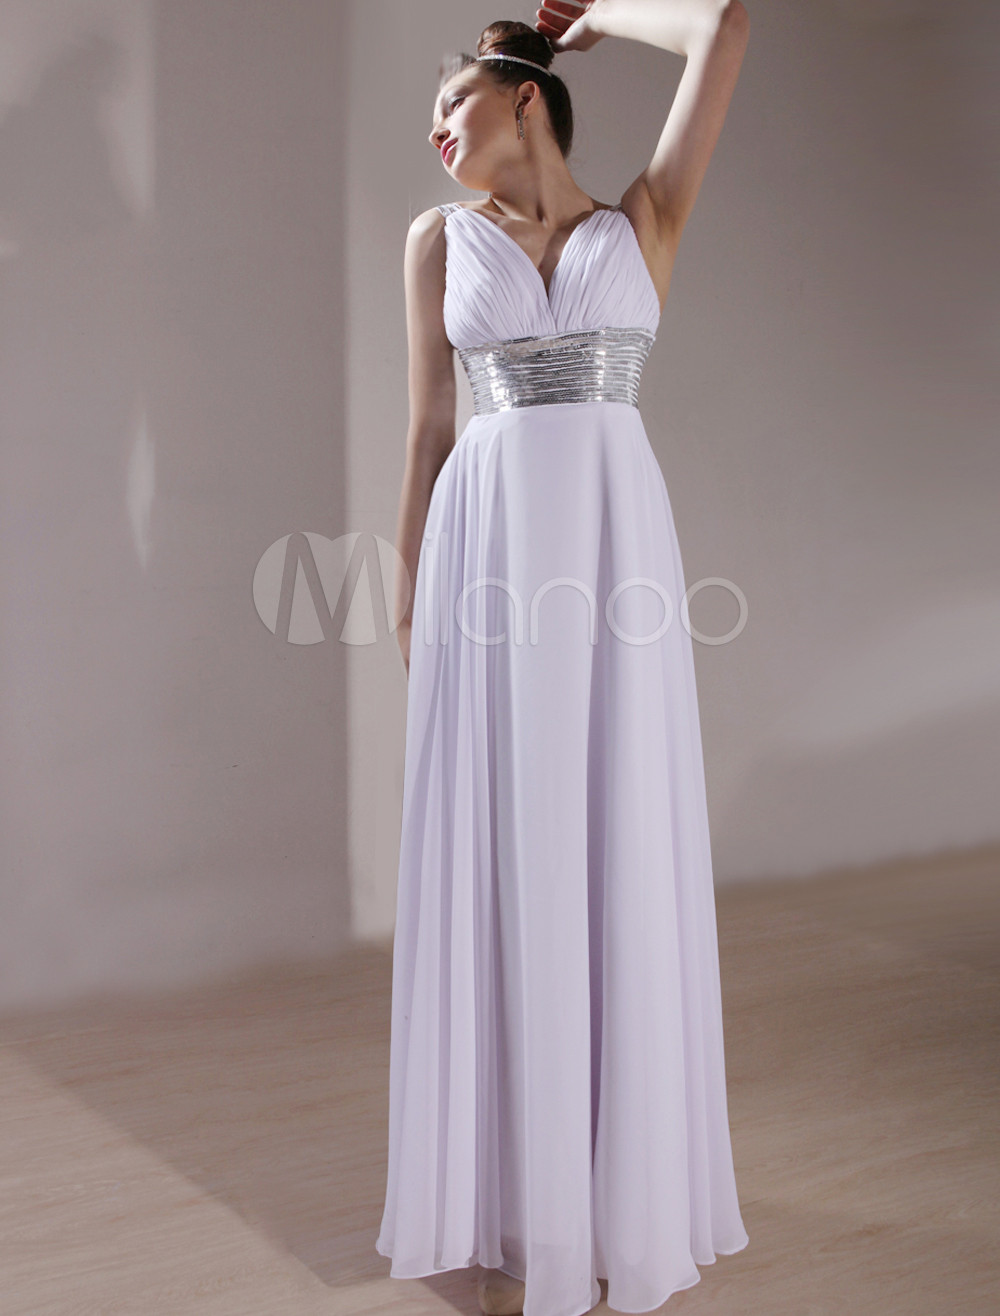 Beautiful White Chiffon V-Neck Sleeveless A-Line Luxury Wedding Dress